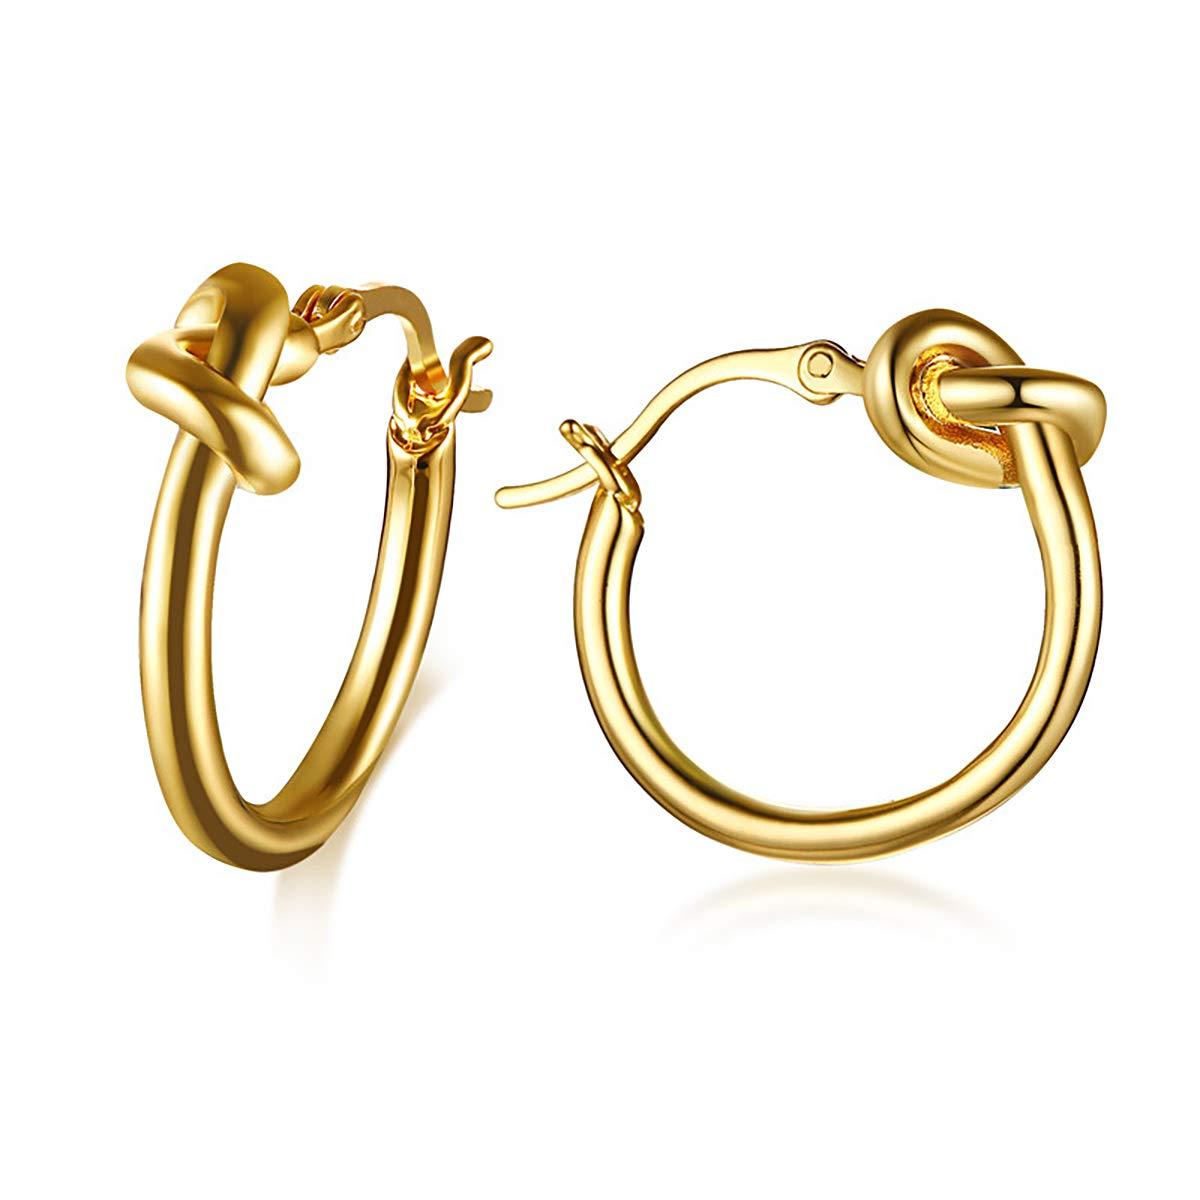 Women Girls Love Knot Hoop Earrings Stainless Steel Round Circle Dangle Earrings